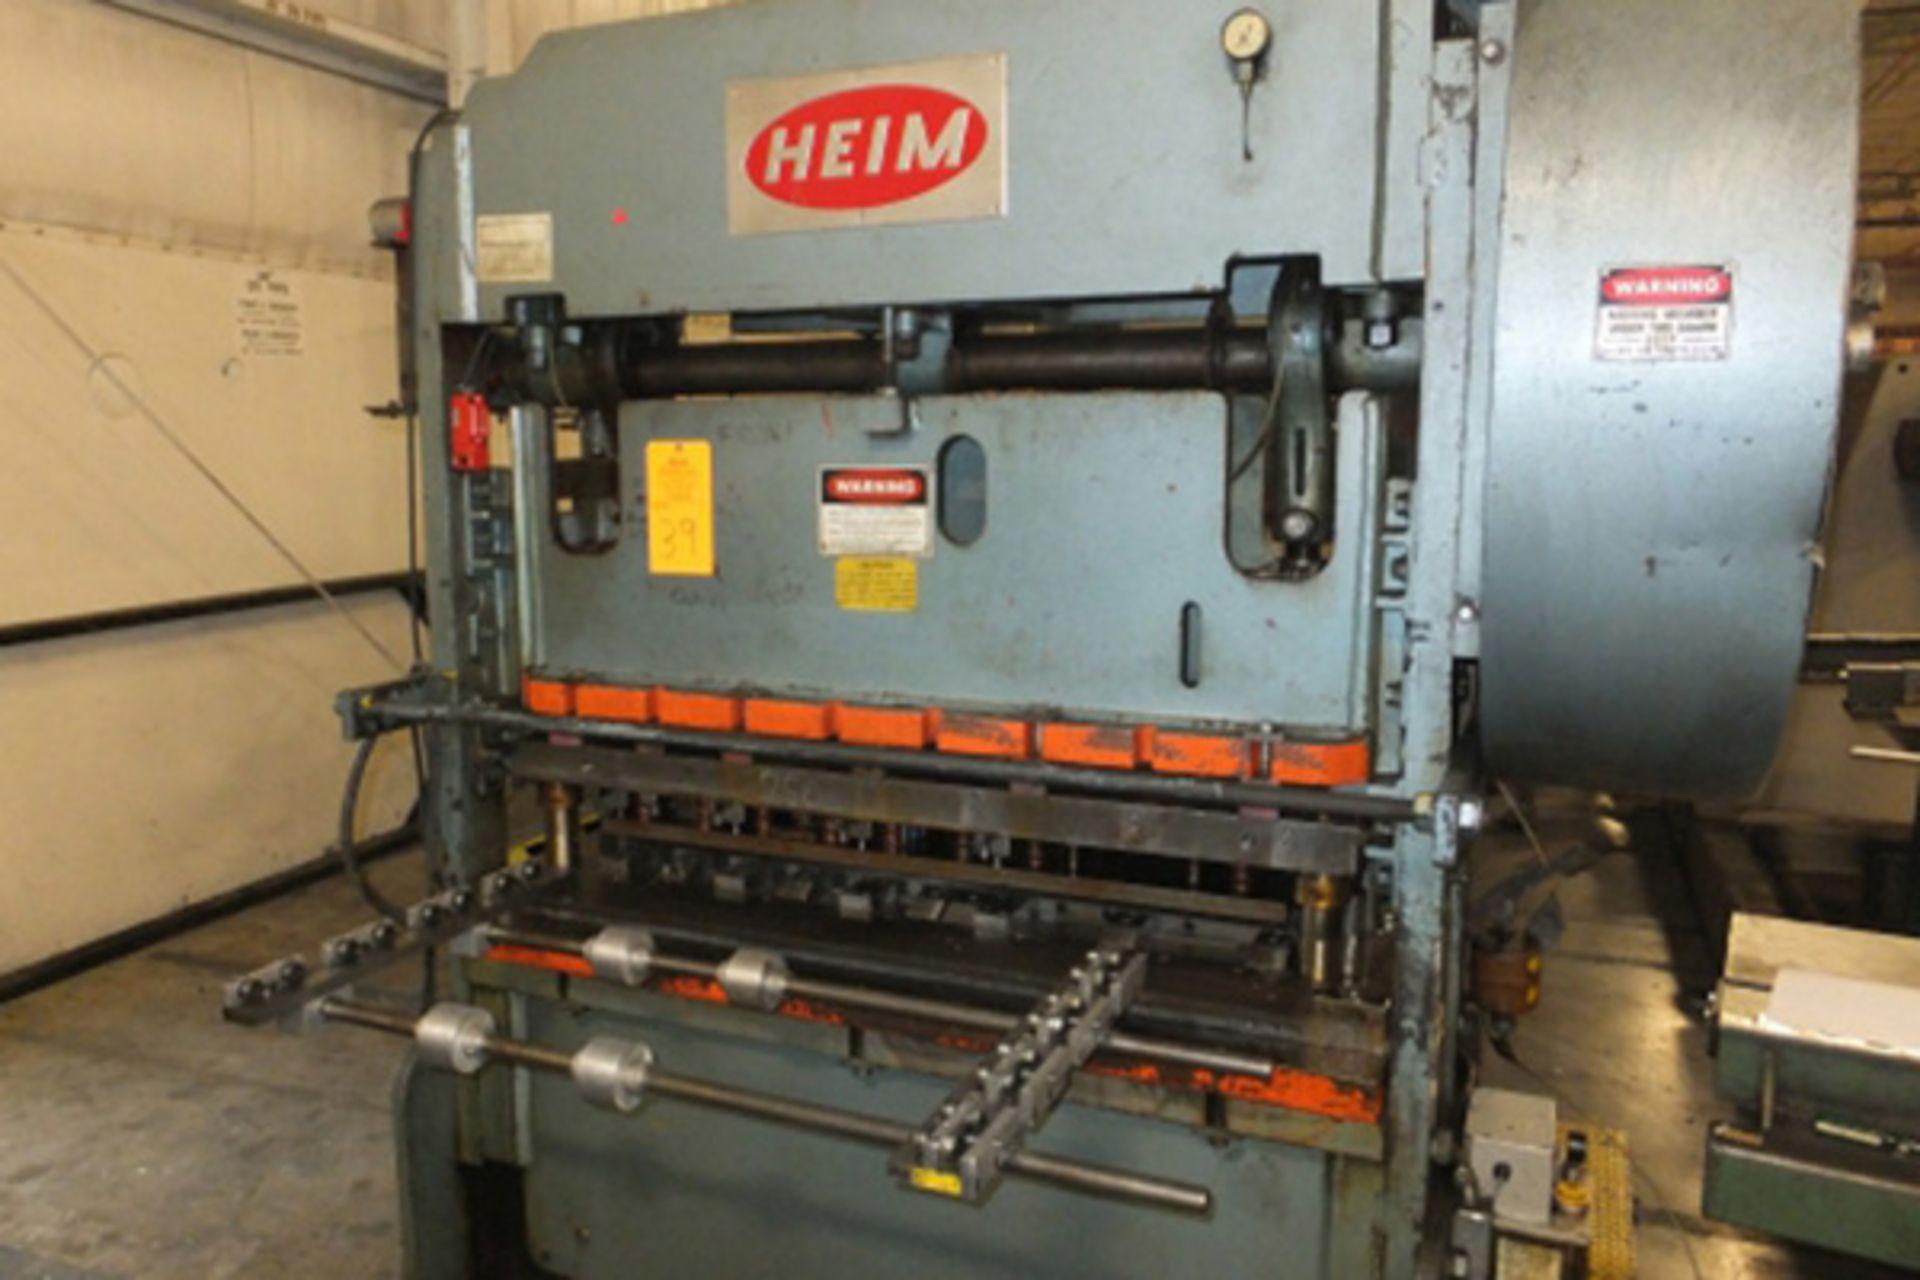 "Lot 26 - Heim Straight Side Double Crank Press   40-Ton x 56"" x 22"", Mdl: S2-40, S/N: H-3668 - 6932P"